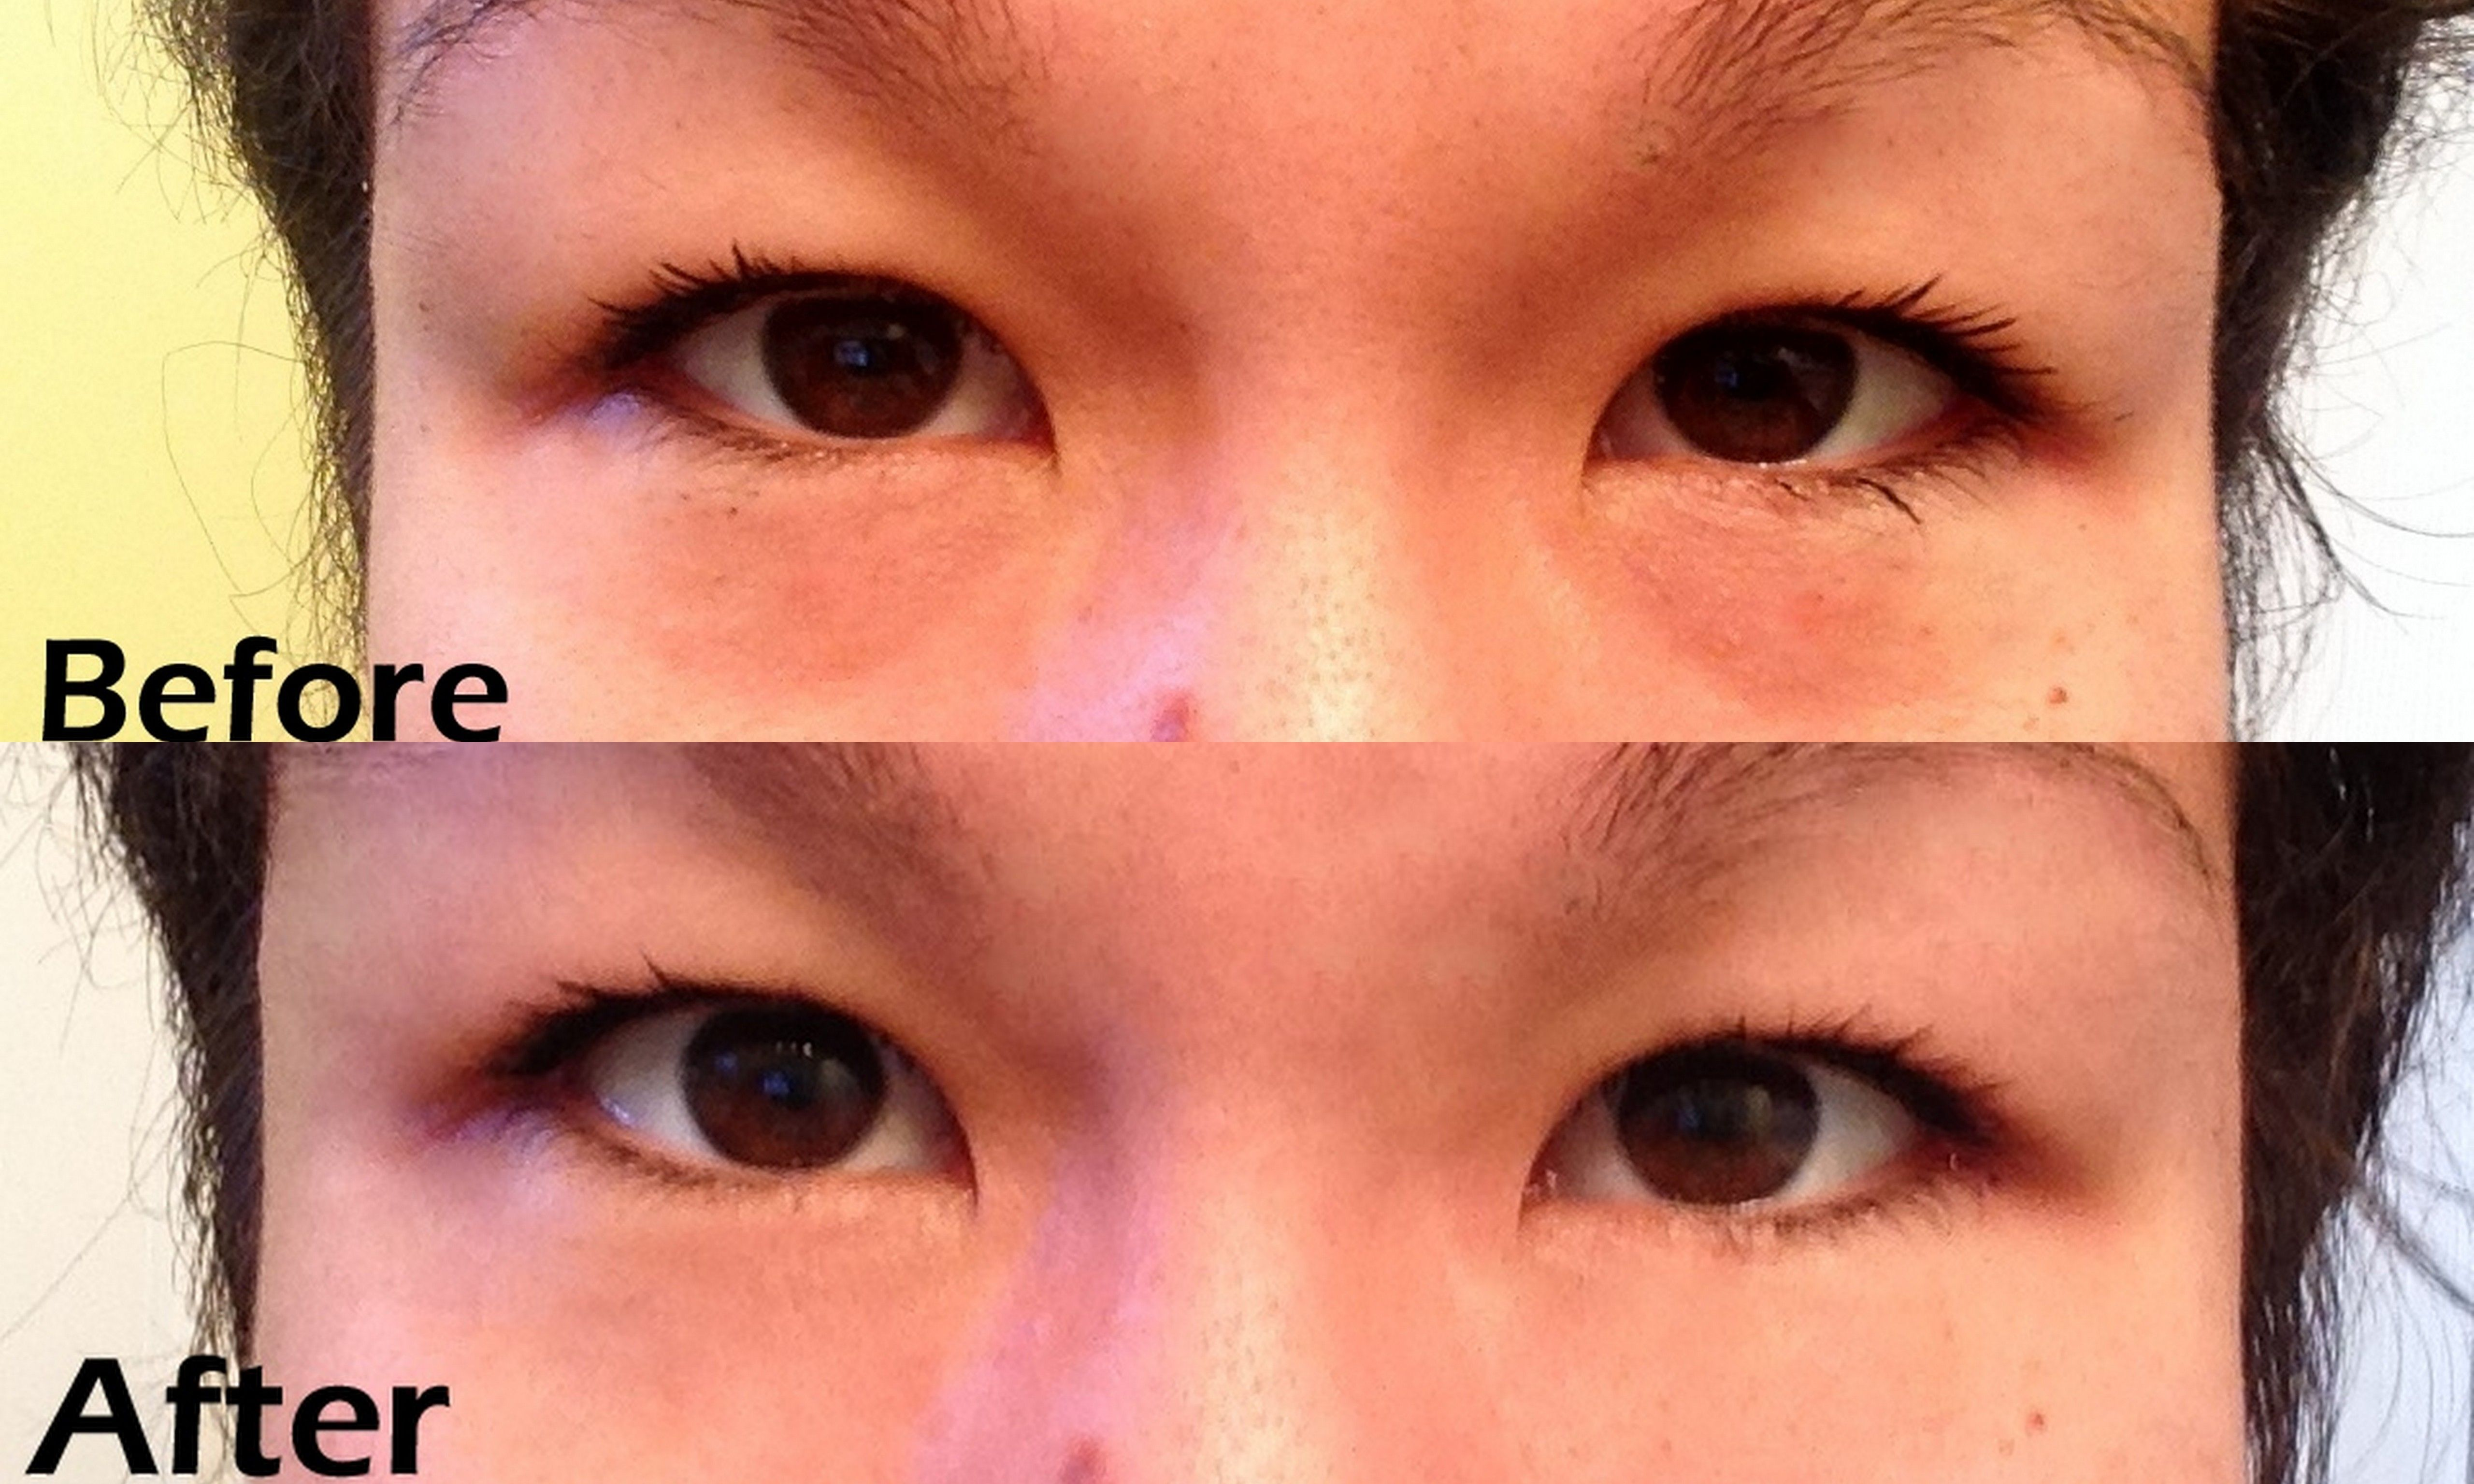 6a34042f250b8ef6a66a5f3133c03b4c - How To Get Rid Of Black Eyes From No Sleep